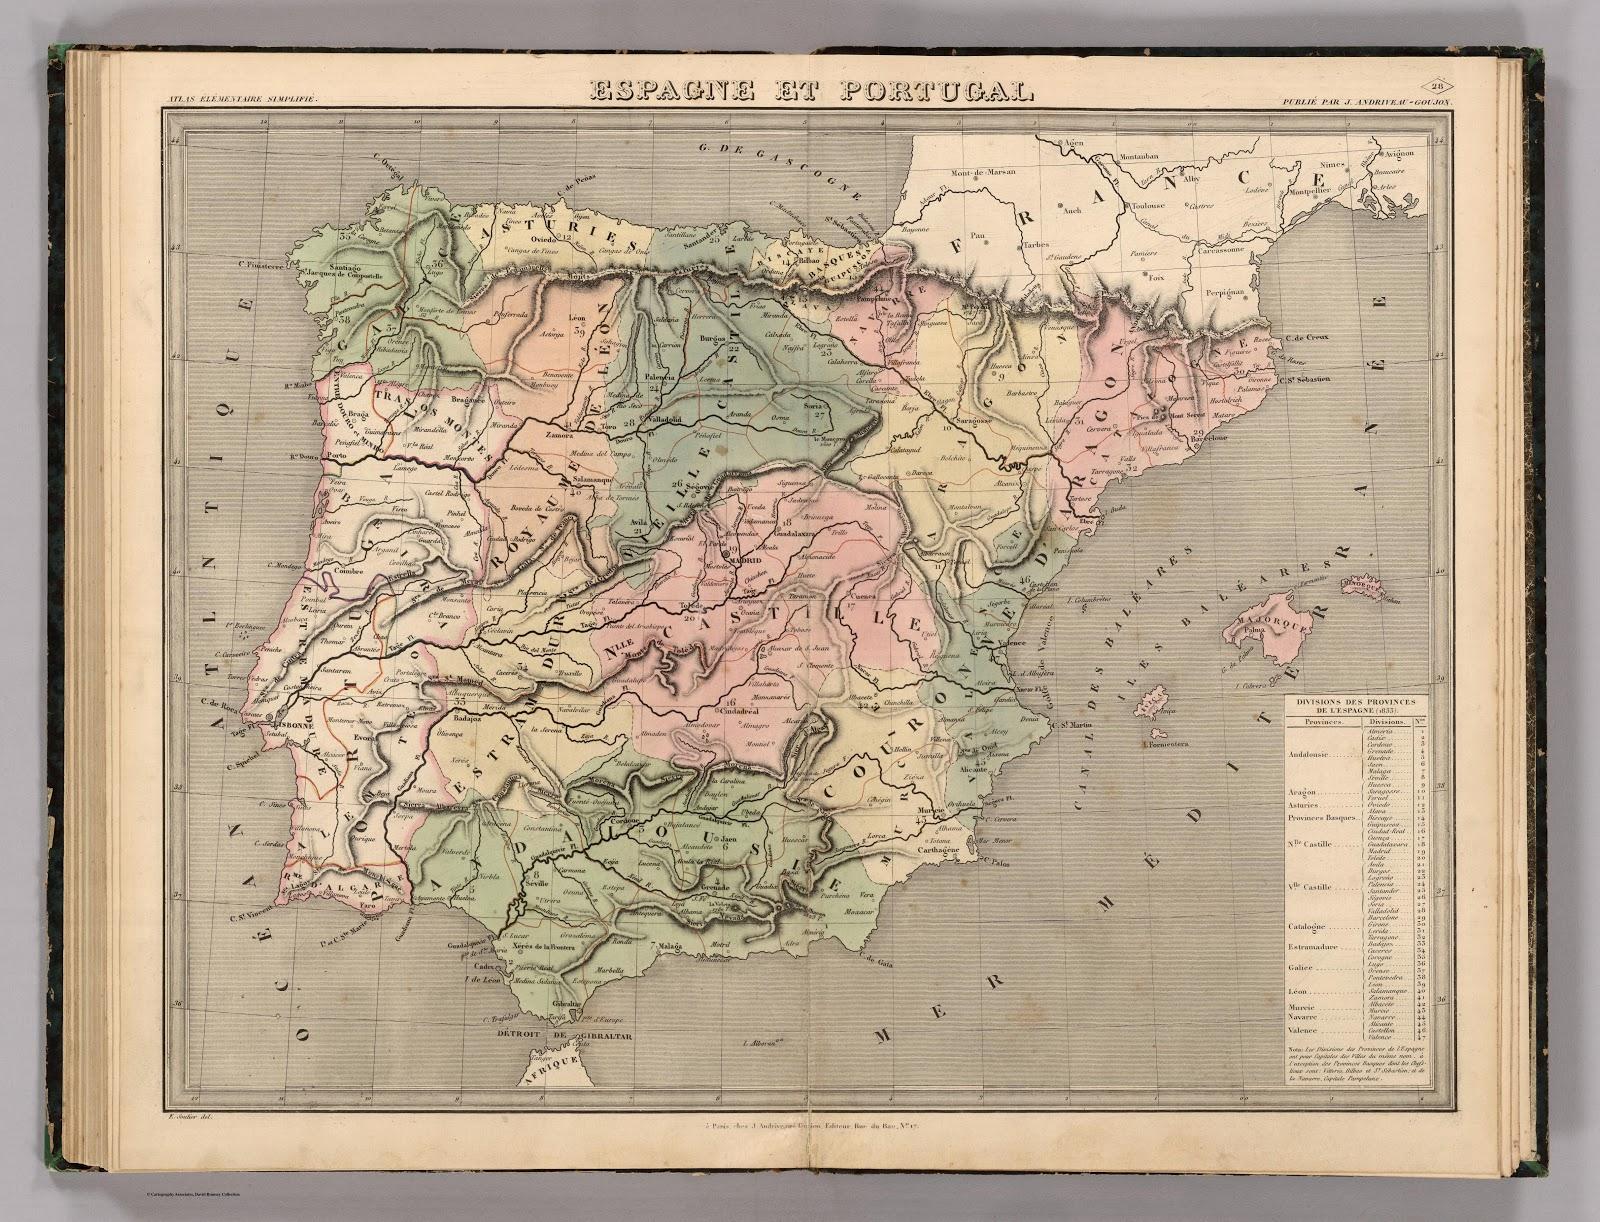 España y Portugal 1838 J. Andriveau y J. Goujon